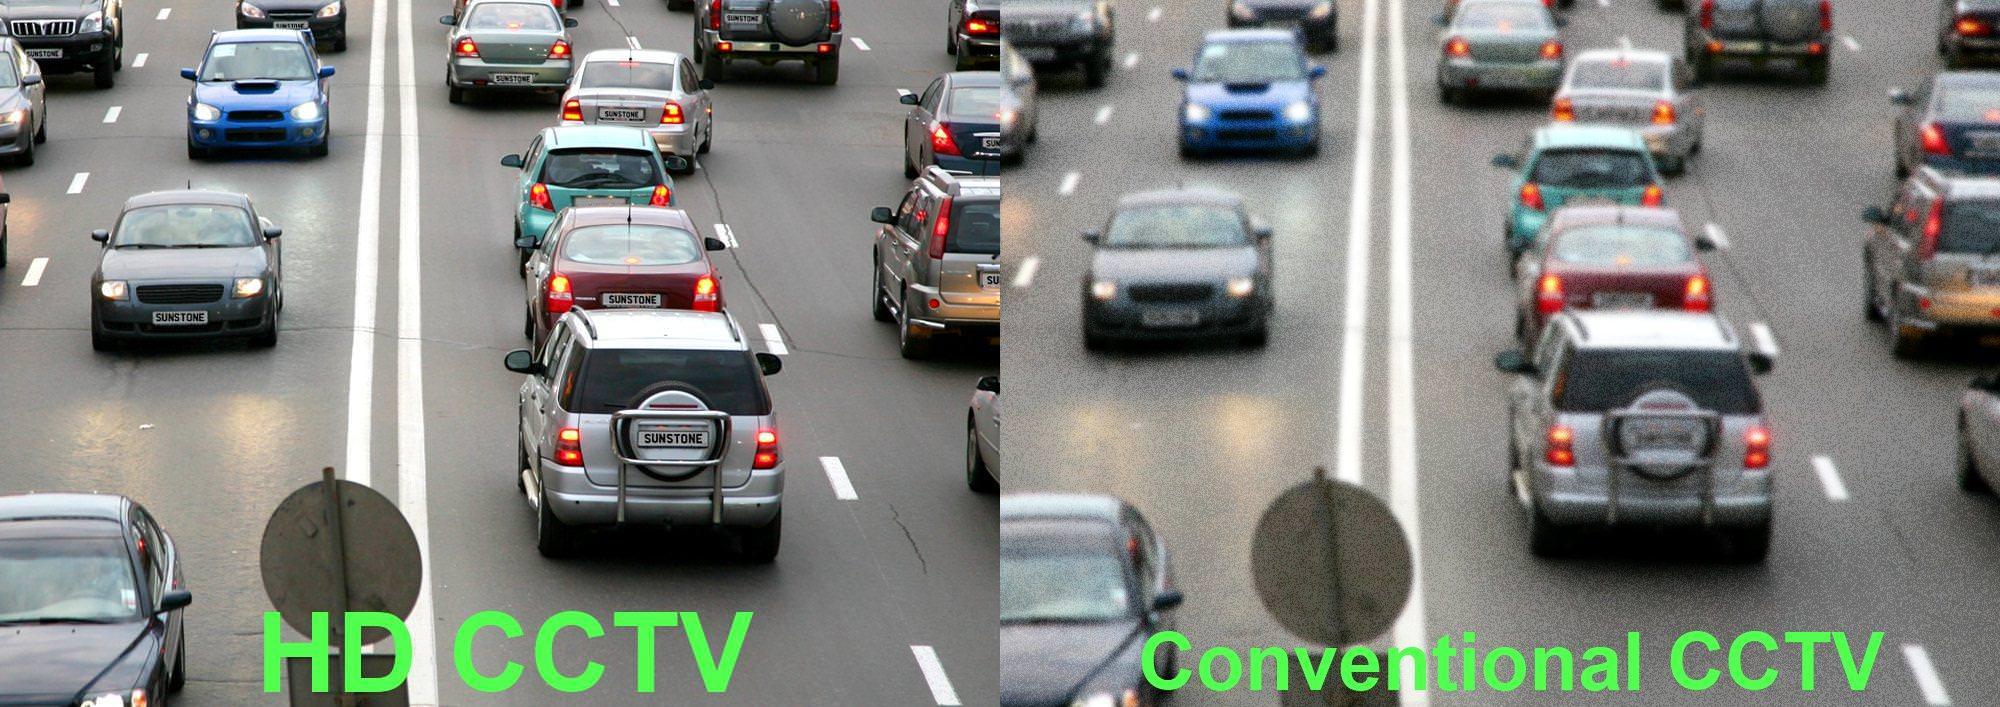 تغییر دوربین آنالوگ به دیجیتال